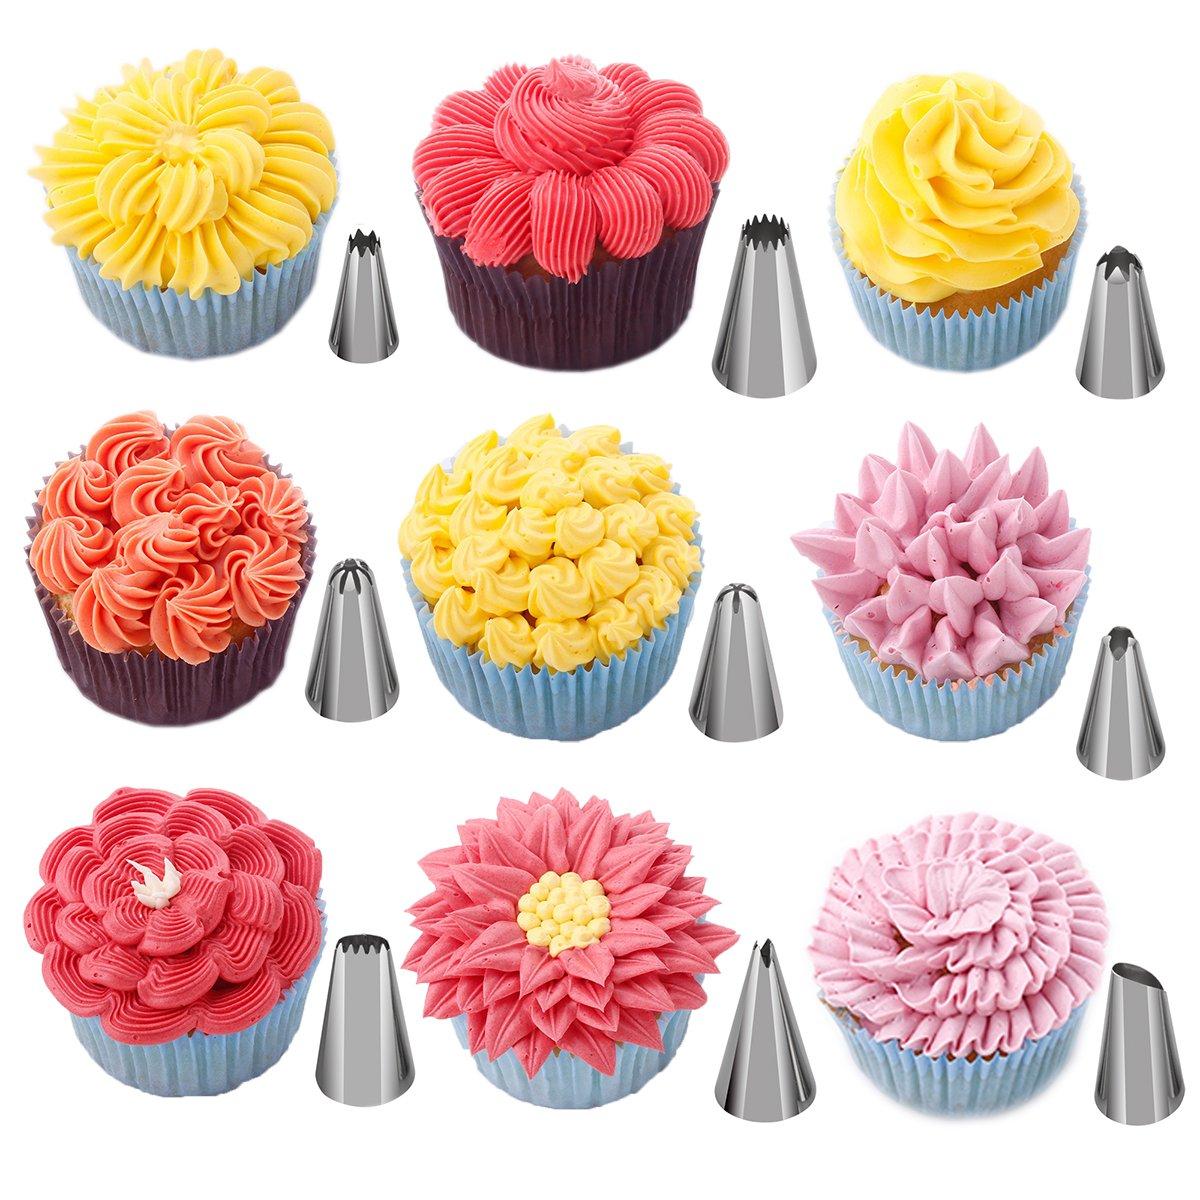 Amazoncom 27PCS Cake Decoration Tips Set 24PCS W Plus